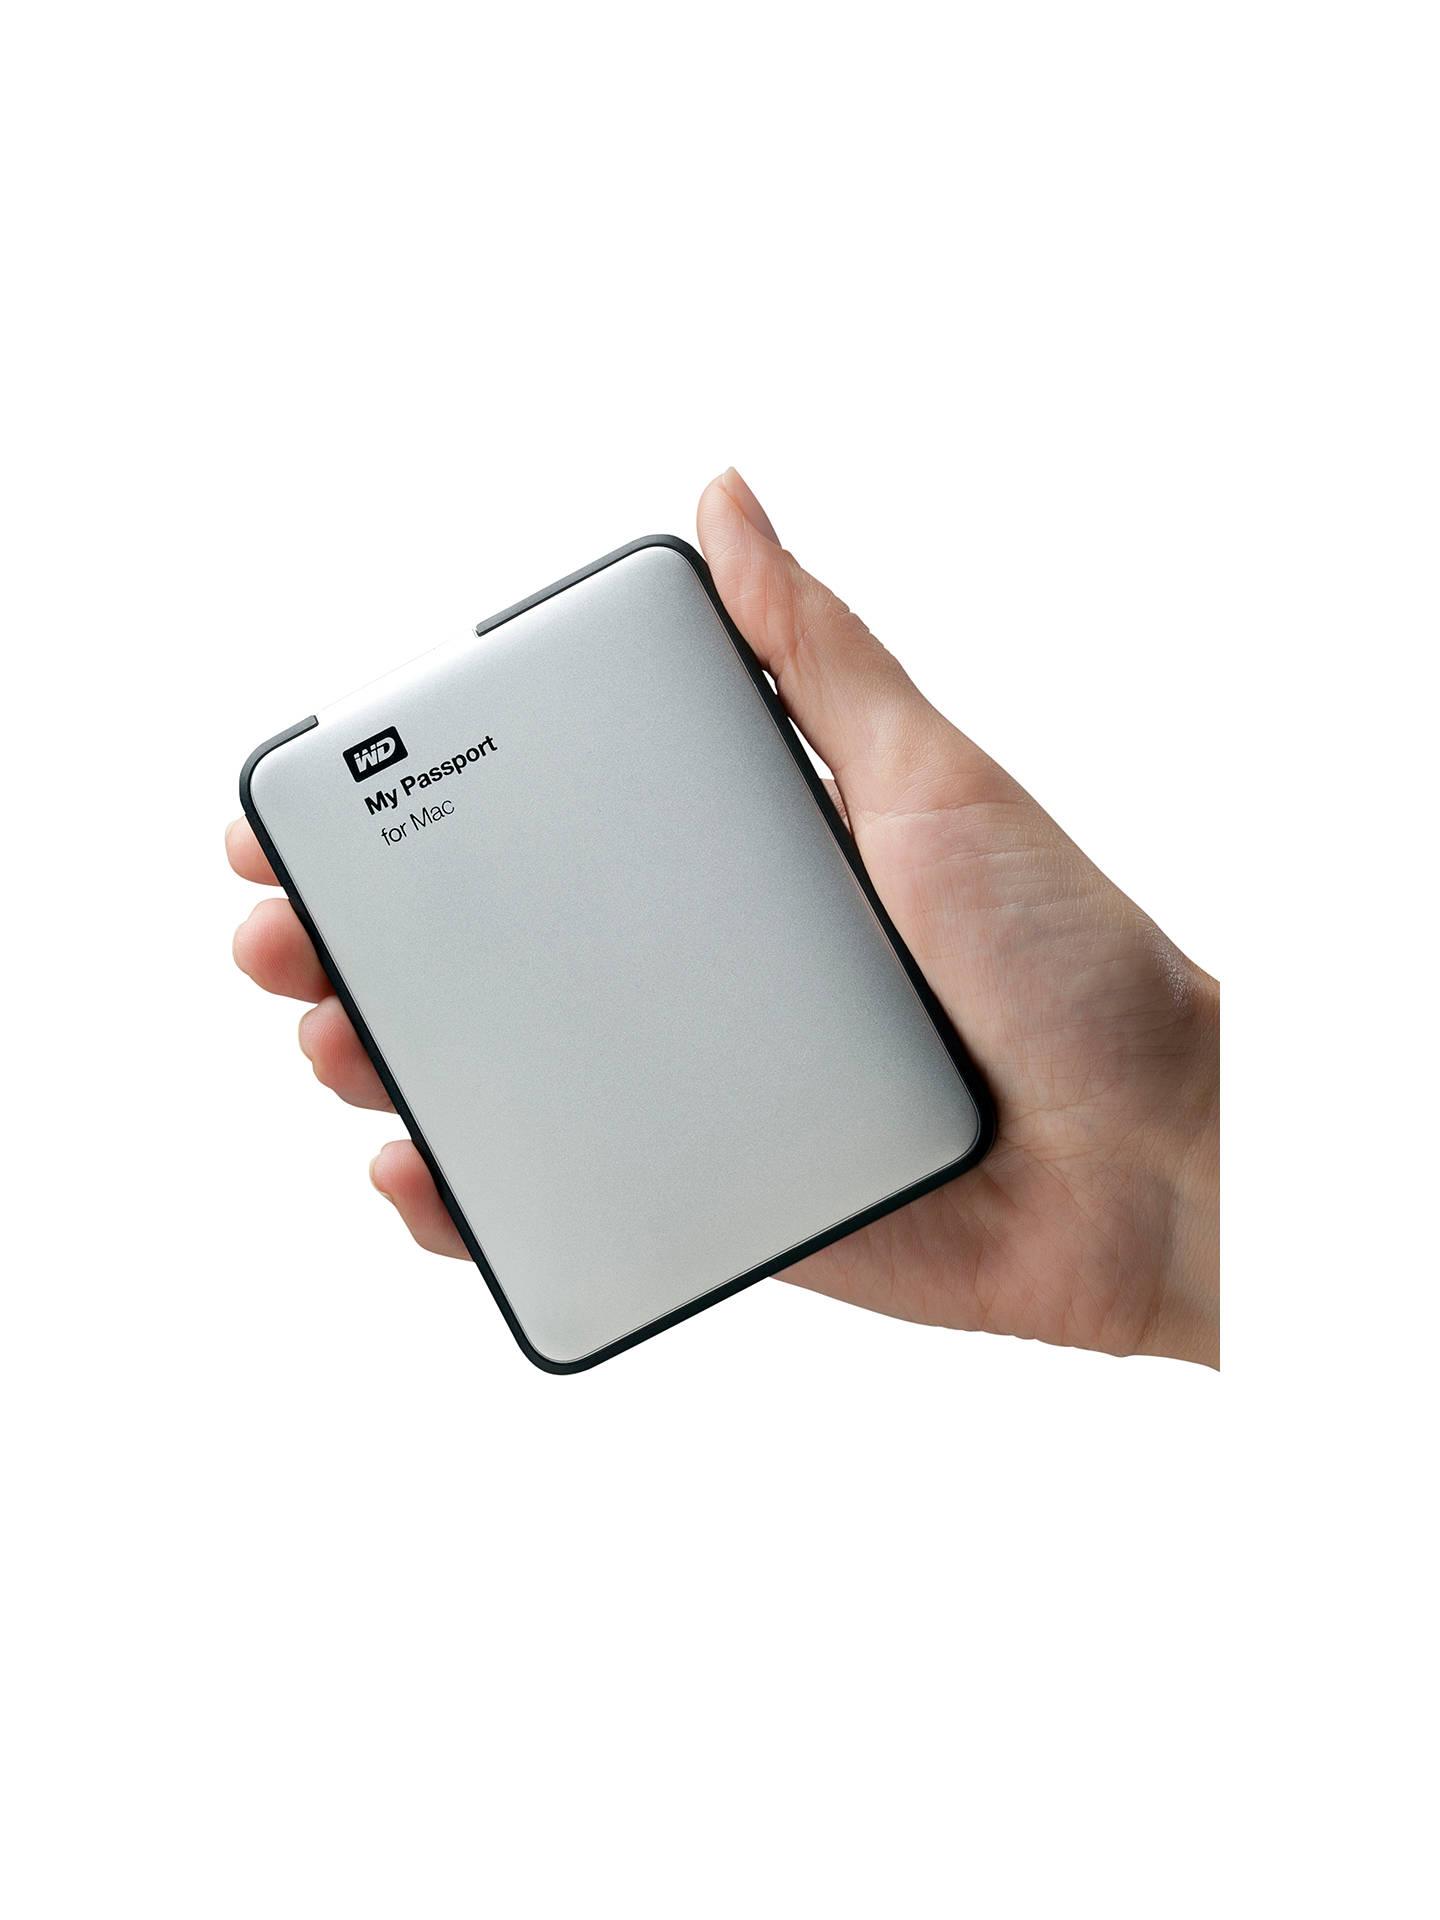 WD My Passport for Mac Portable Hard Drive, USB 3 0, 2TB